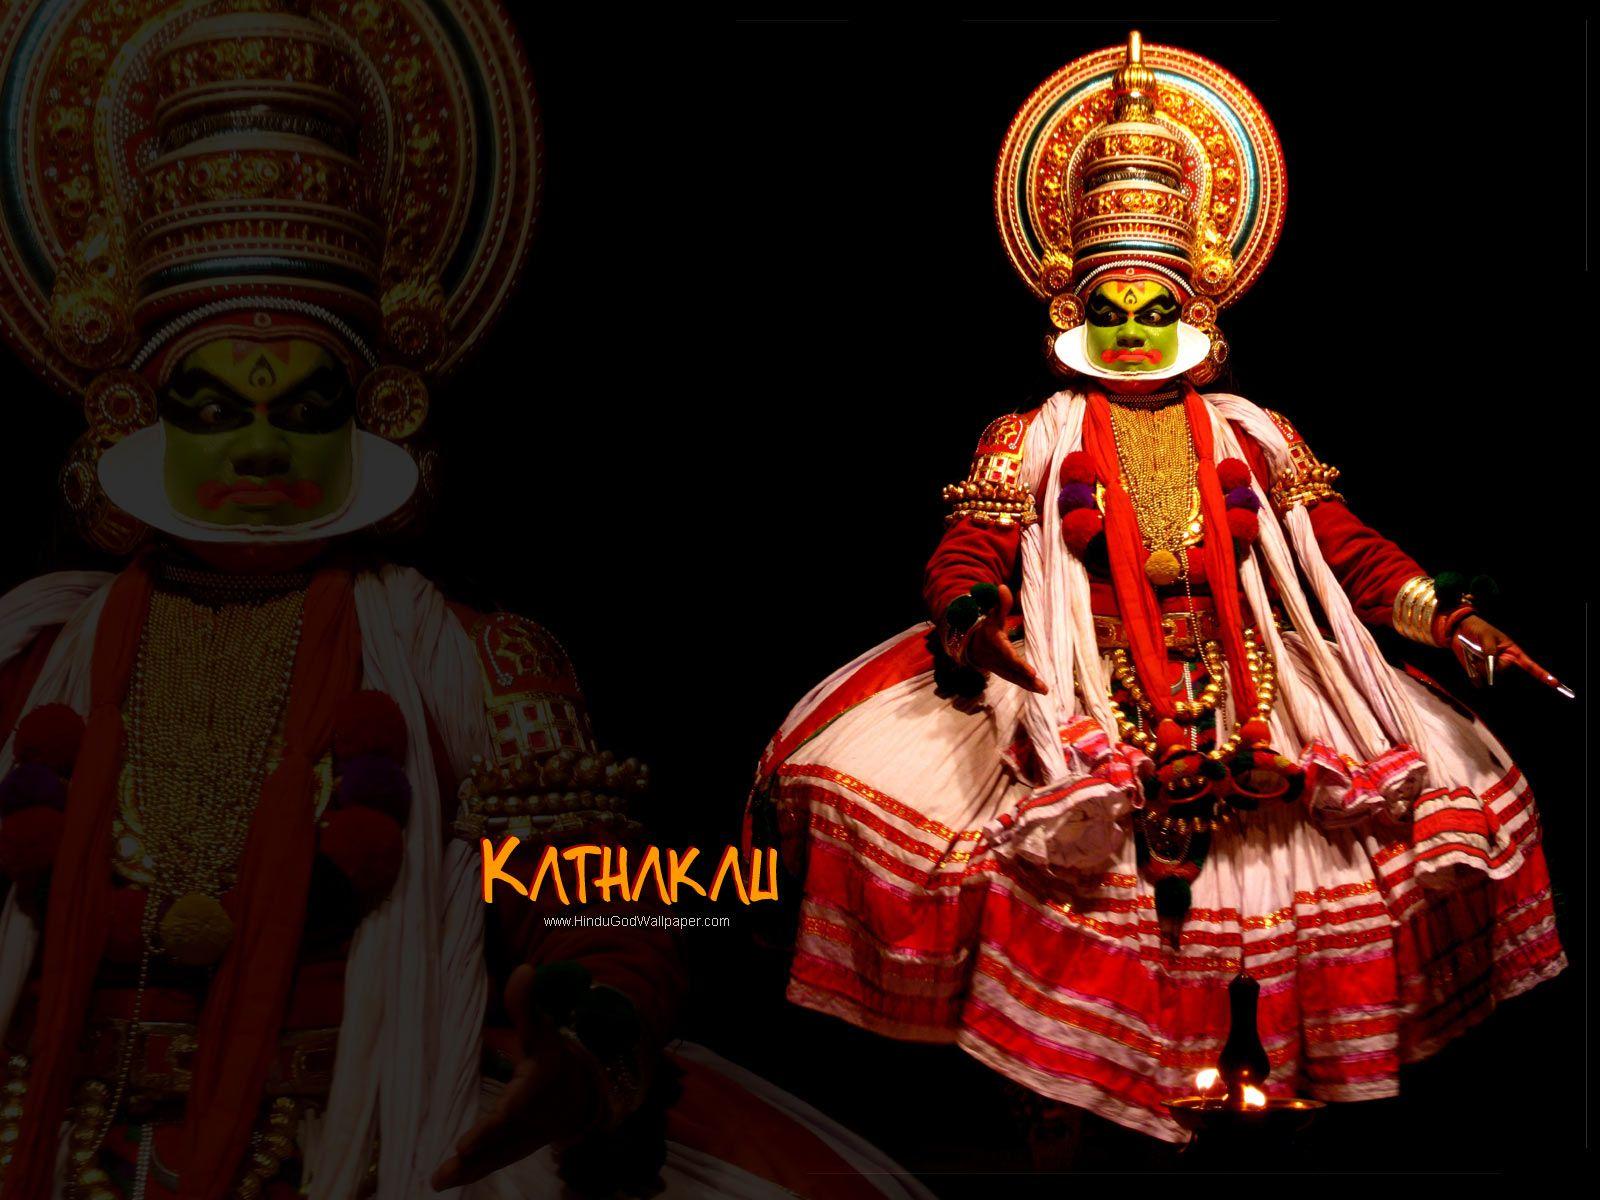 Hd wallpaper kerala - Free Kerala Kathakali Hd Wallpaper Download Onam Wallpapers Pinterest Wallpaper Downloads